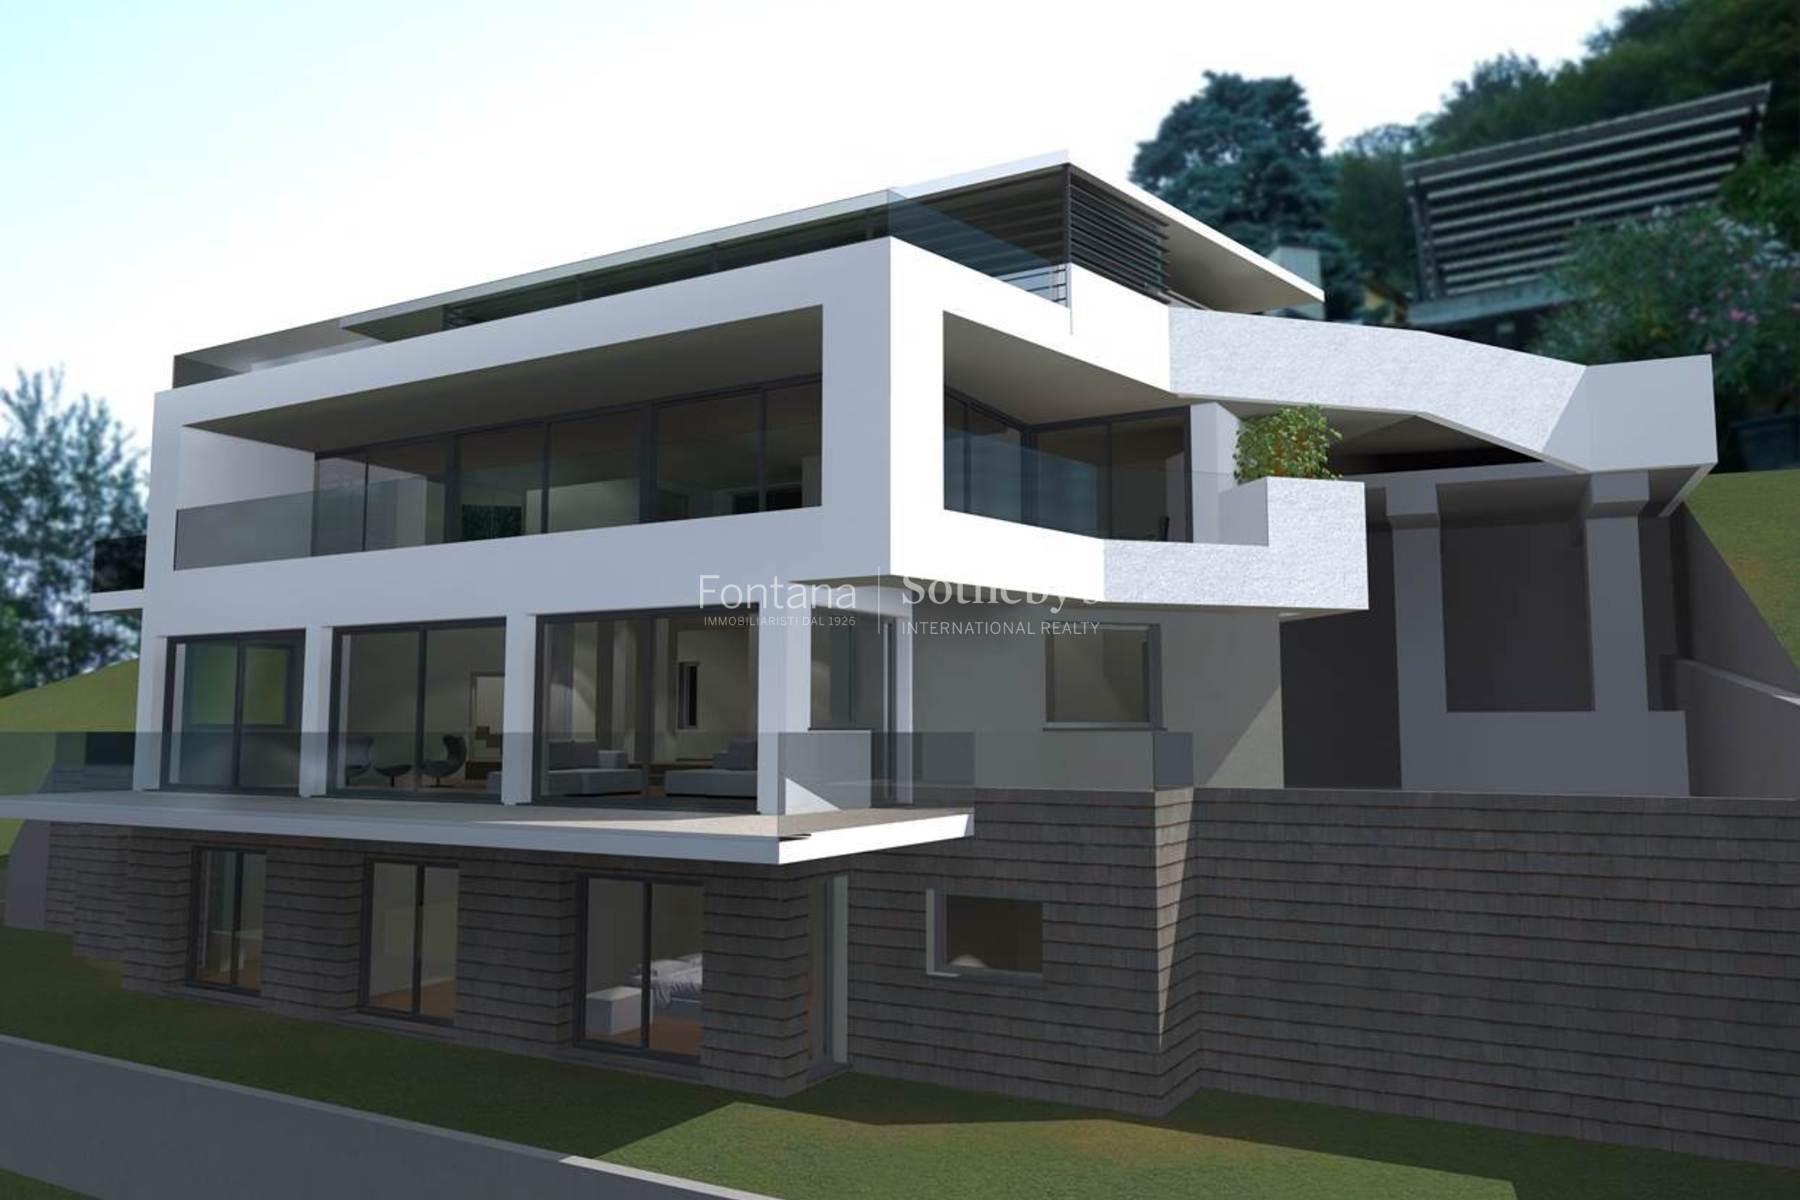 Single Family Home for Sale at Modern luxury villa set in an exclusive location Montagnola Montagnola, Ticino, 6926 Switzerland